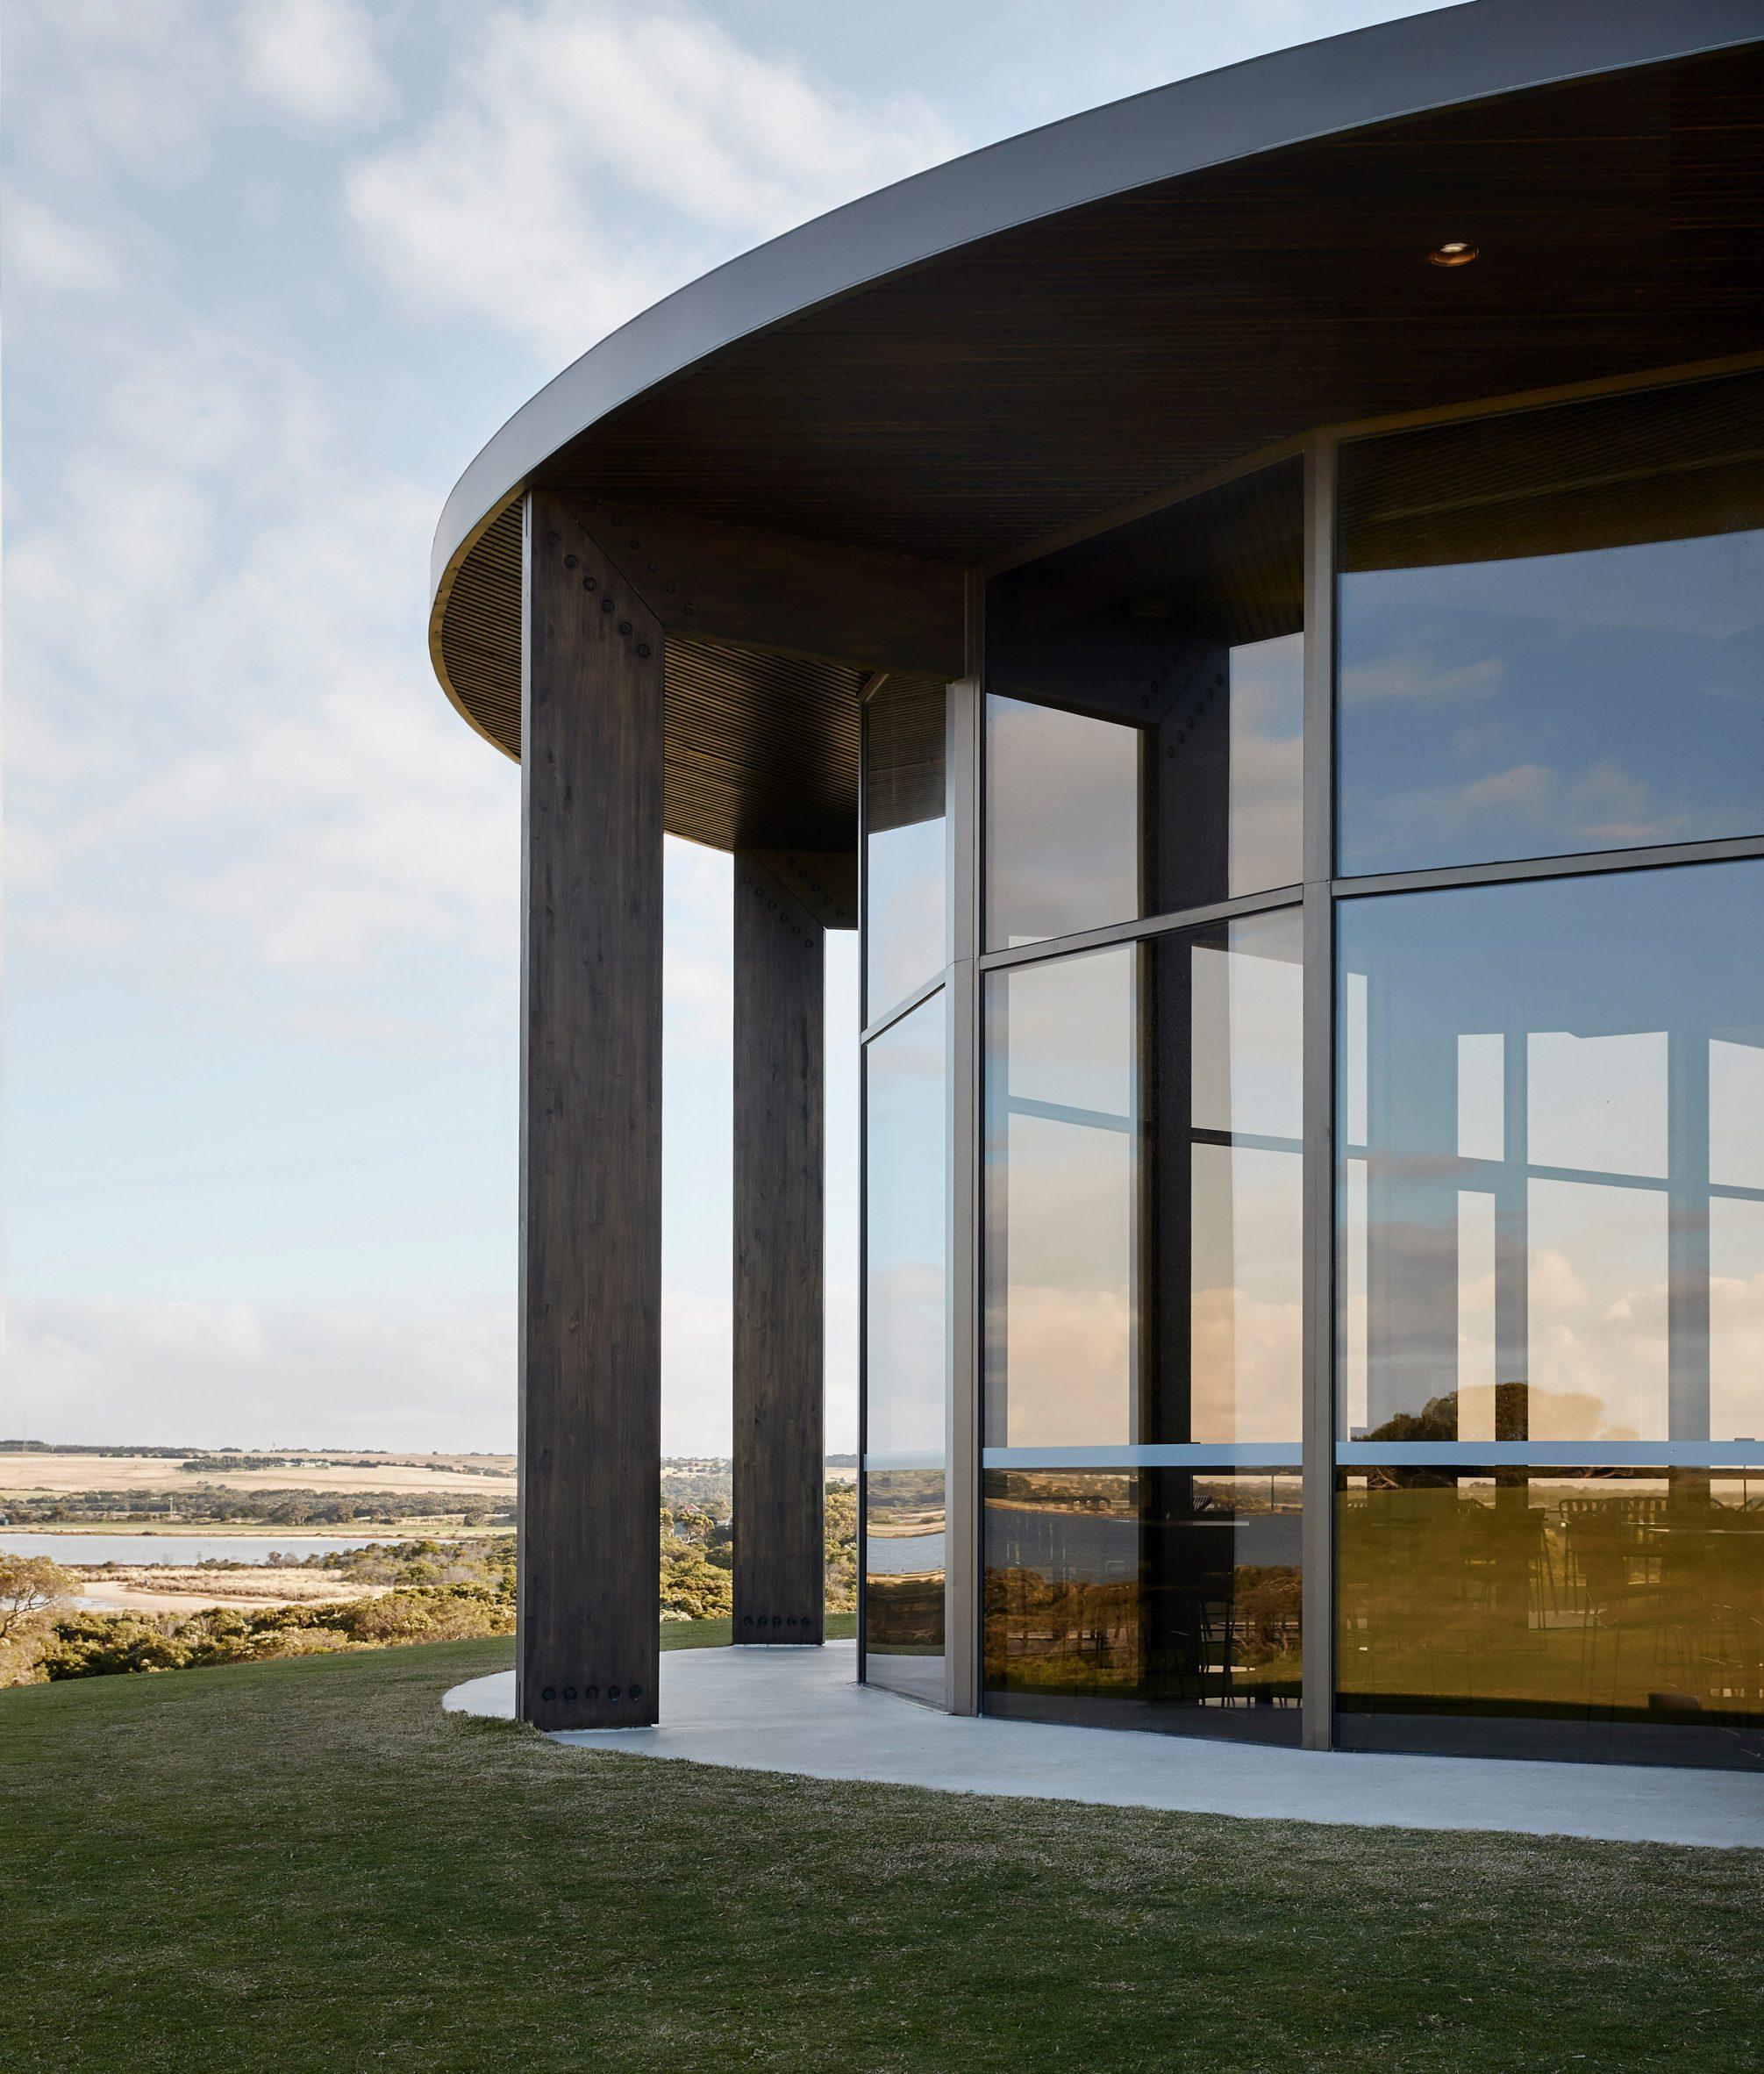 Lonsdale Links golf club has floor-to-ceiling windows